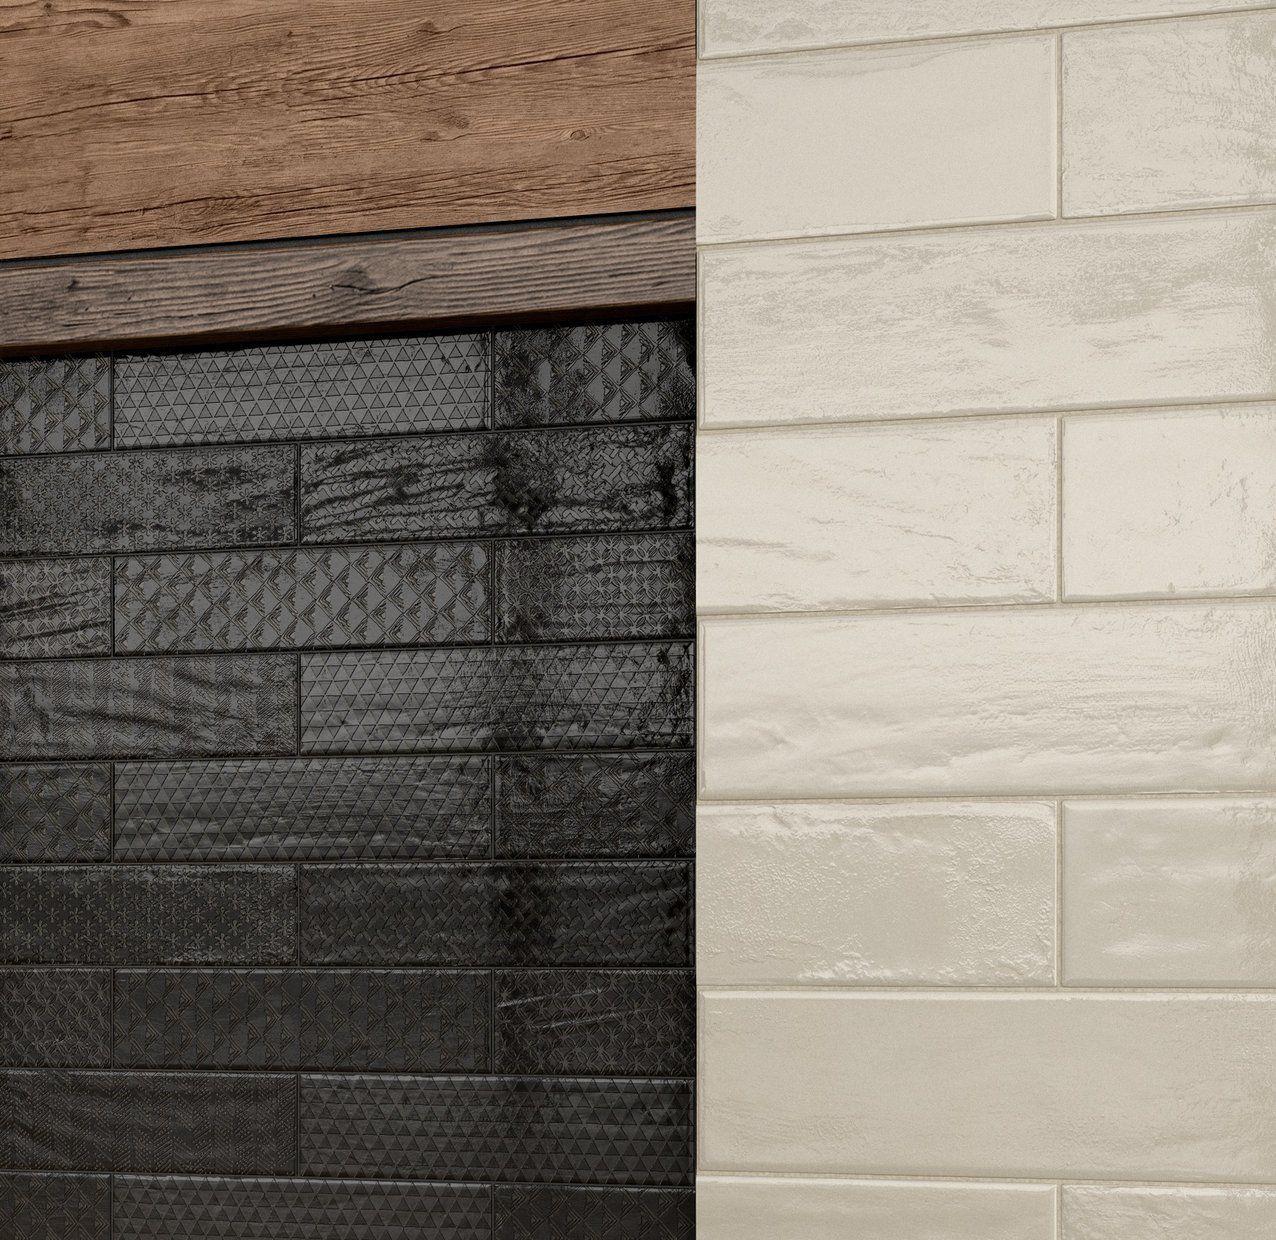 Rak Ceramics Bathroom Tiles Tiles Design Ideas